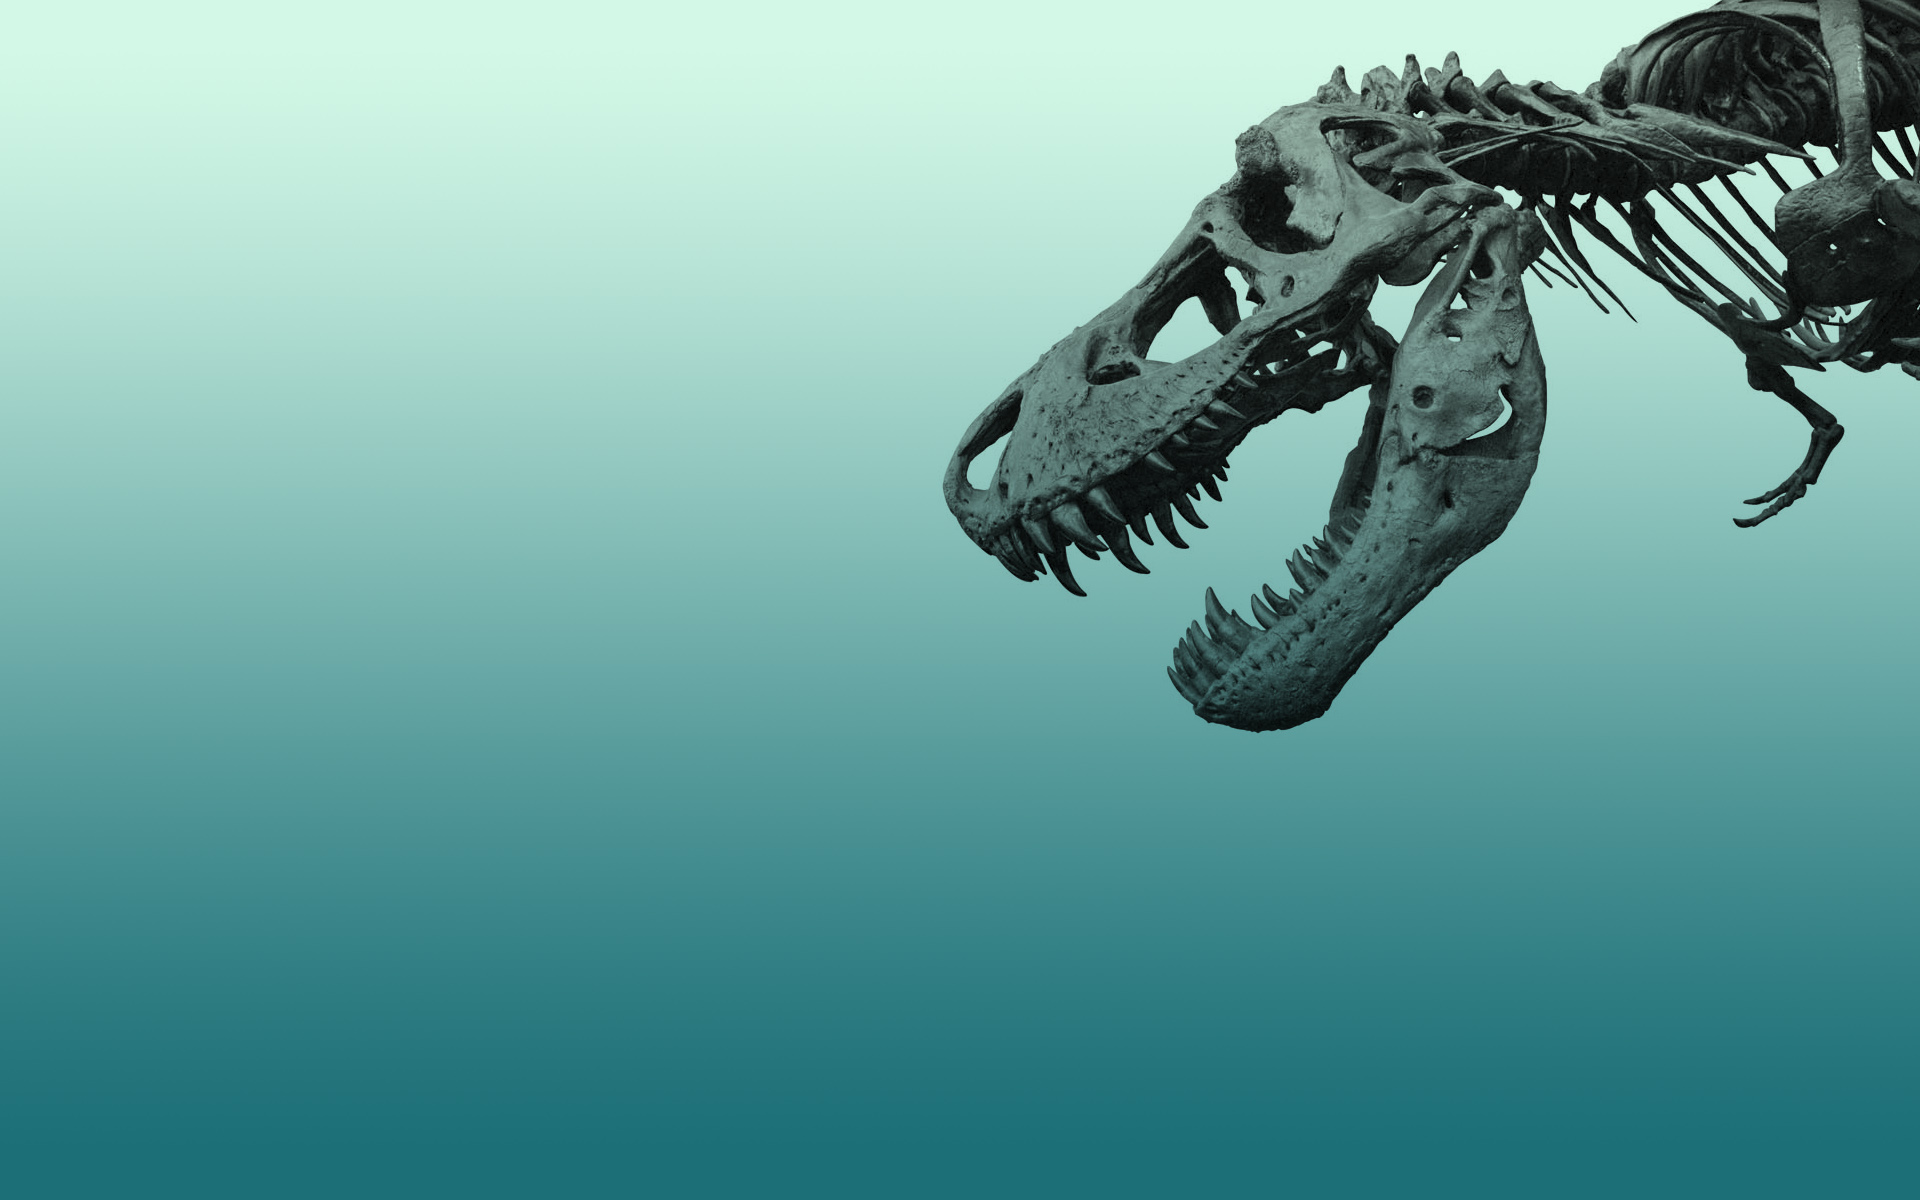 Dinosaur Desktop Backgrounds 1920x1200